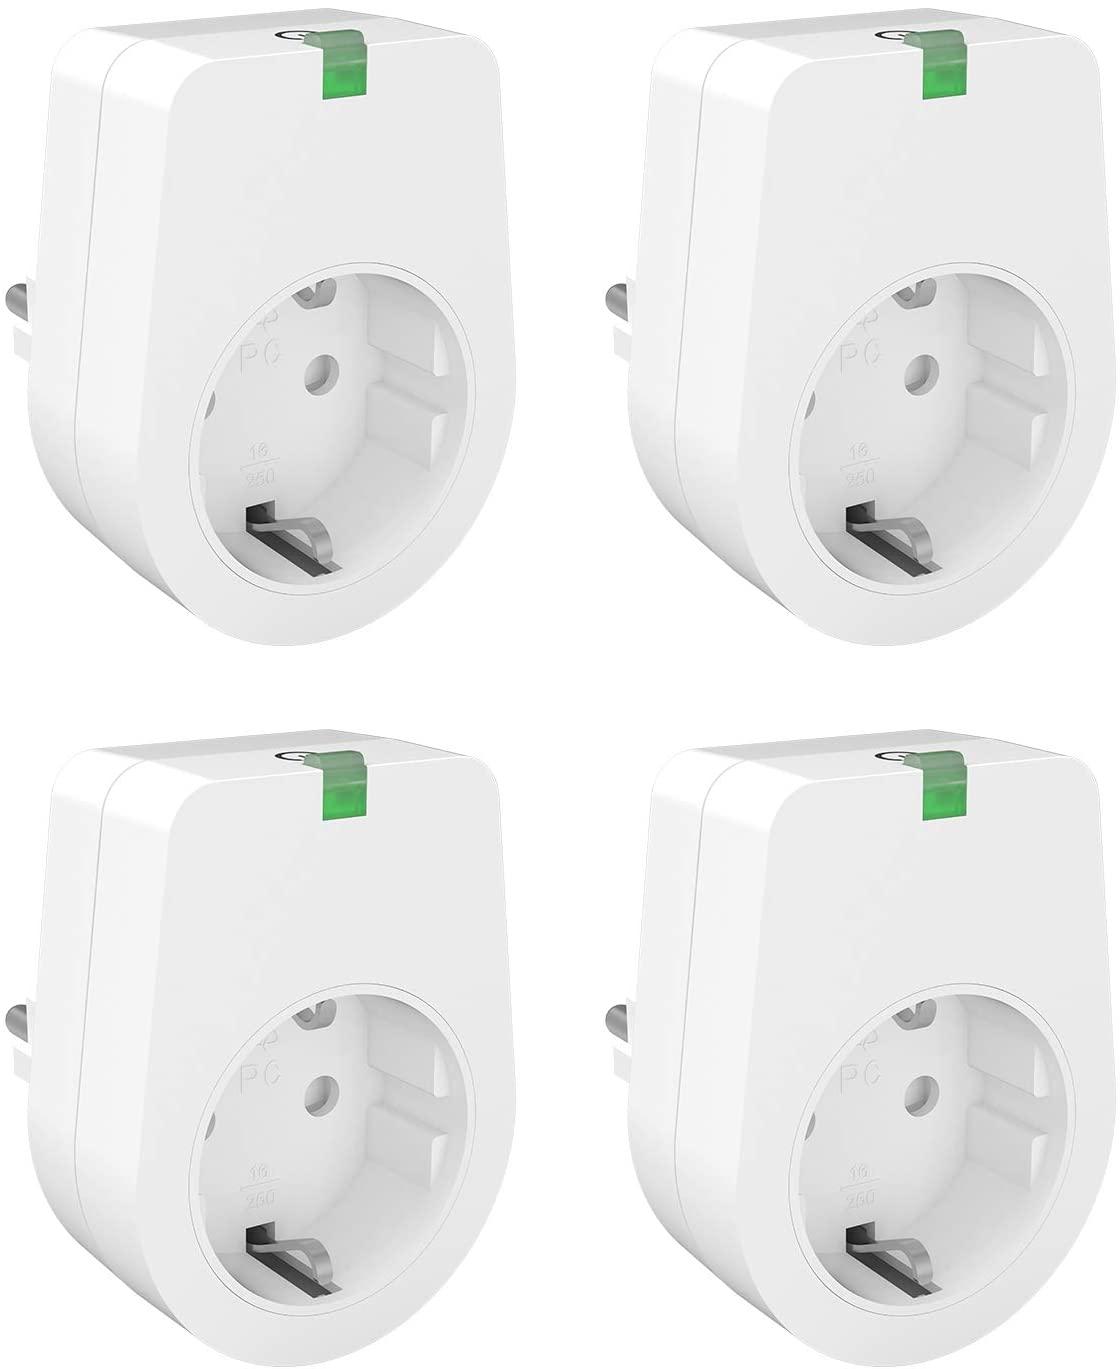 4 x Enchufe wifi compatible Alexa y Google home - Luvon